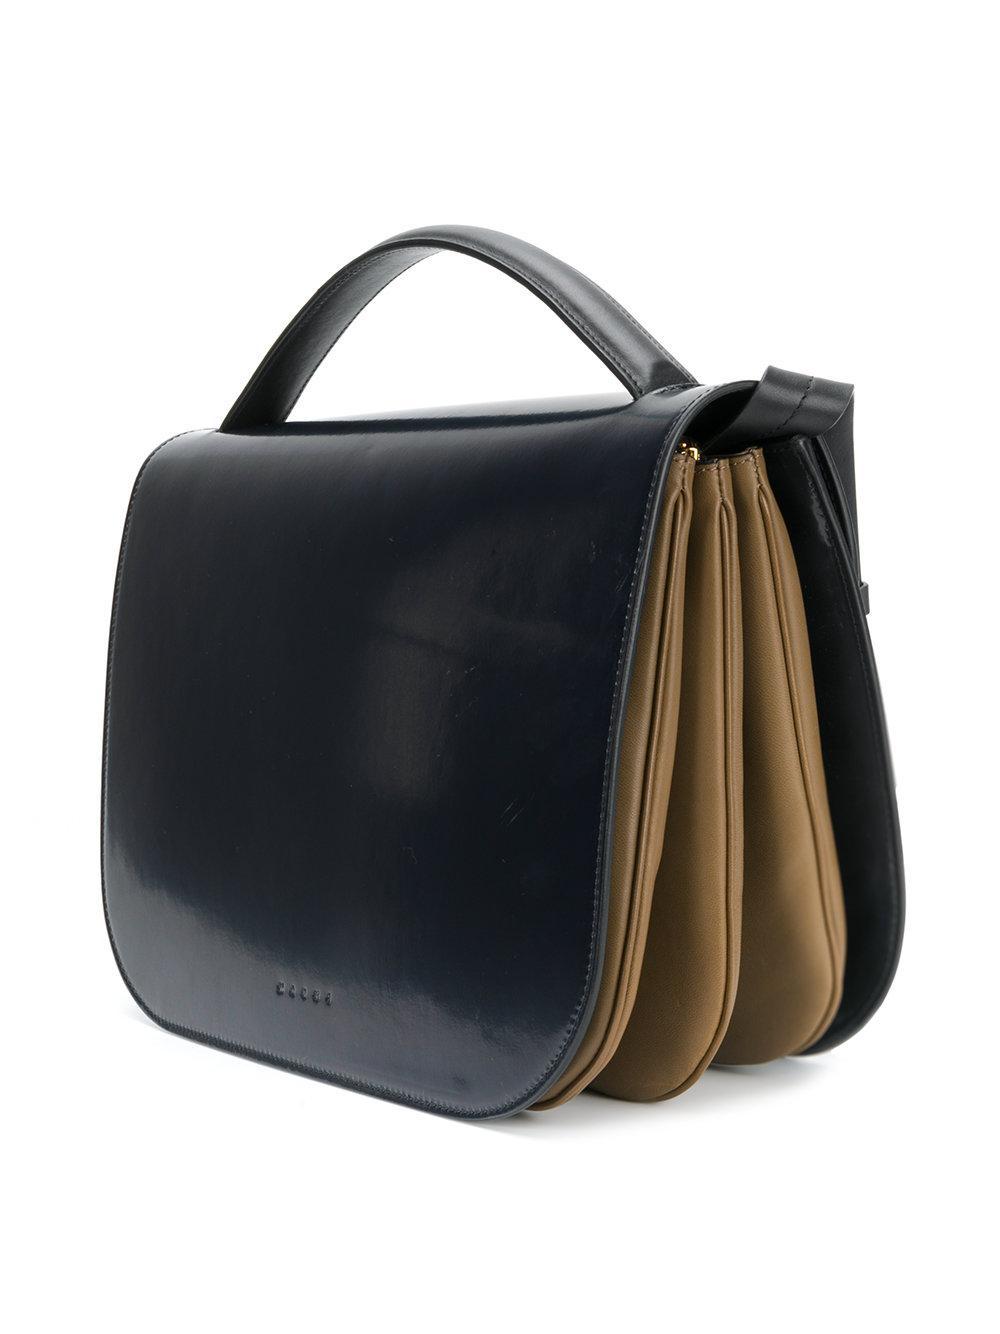 Marni Leather Tuk Large Tote Bag in Blue